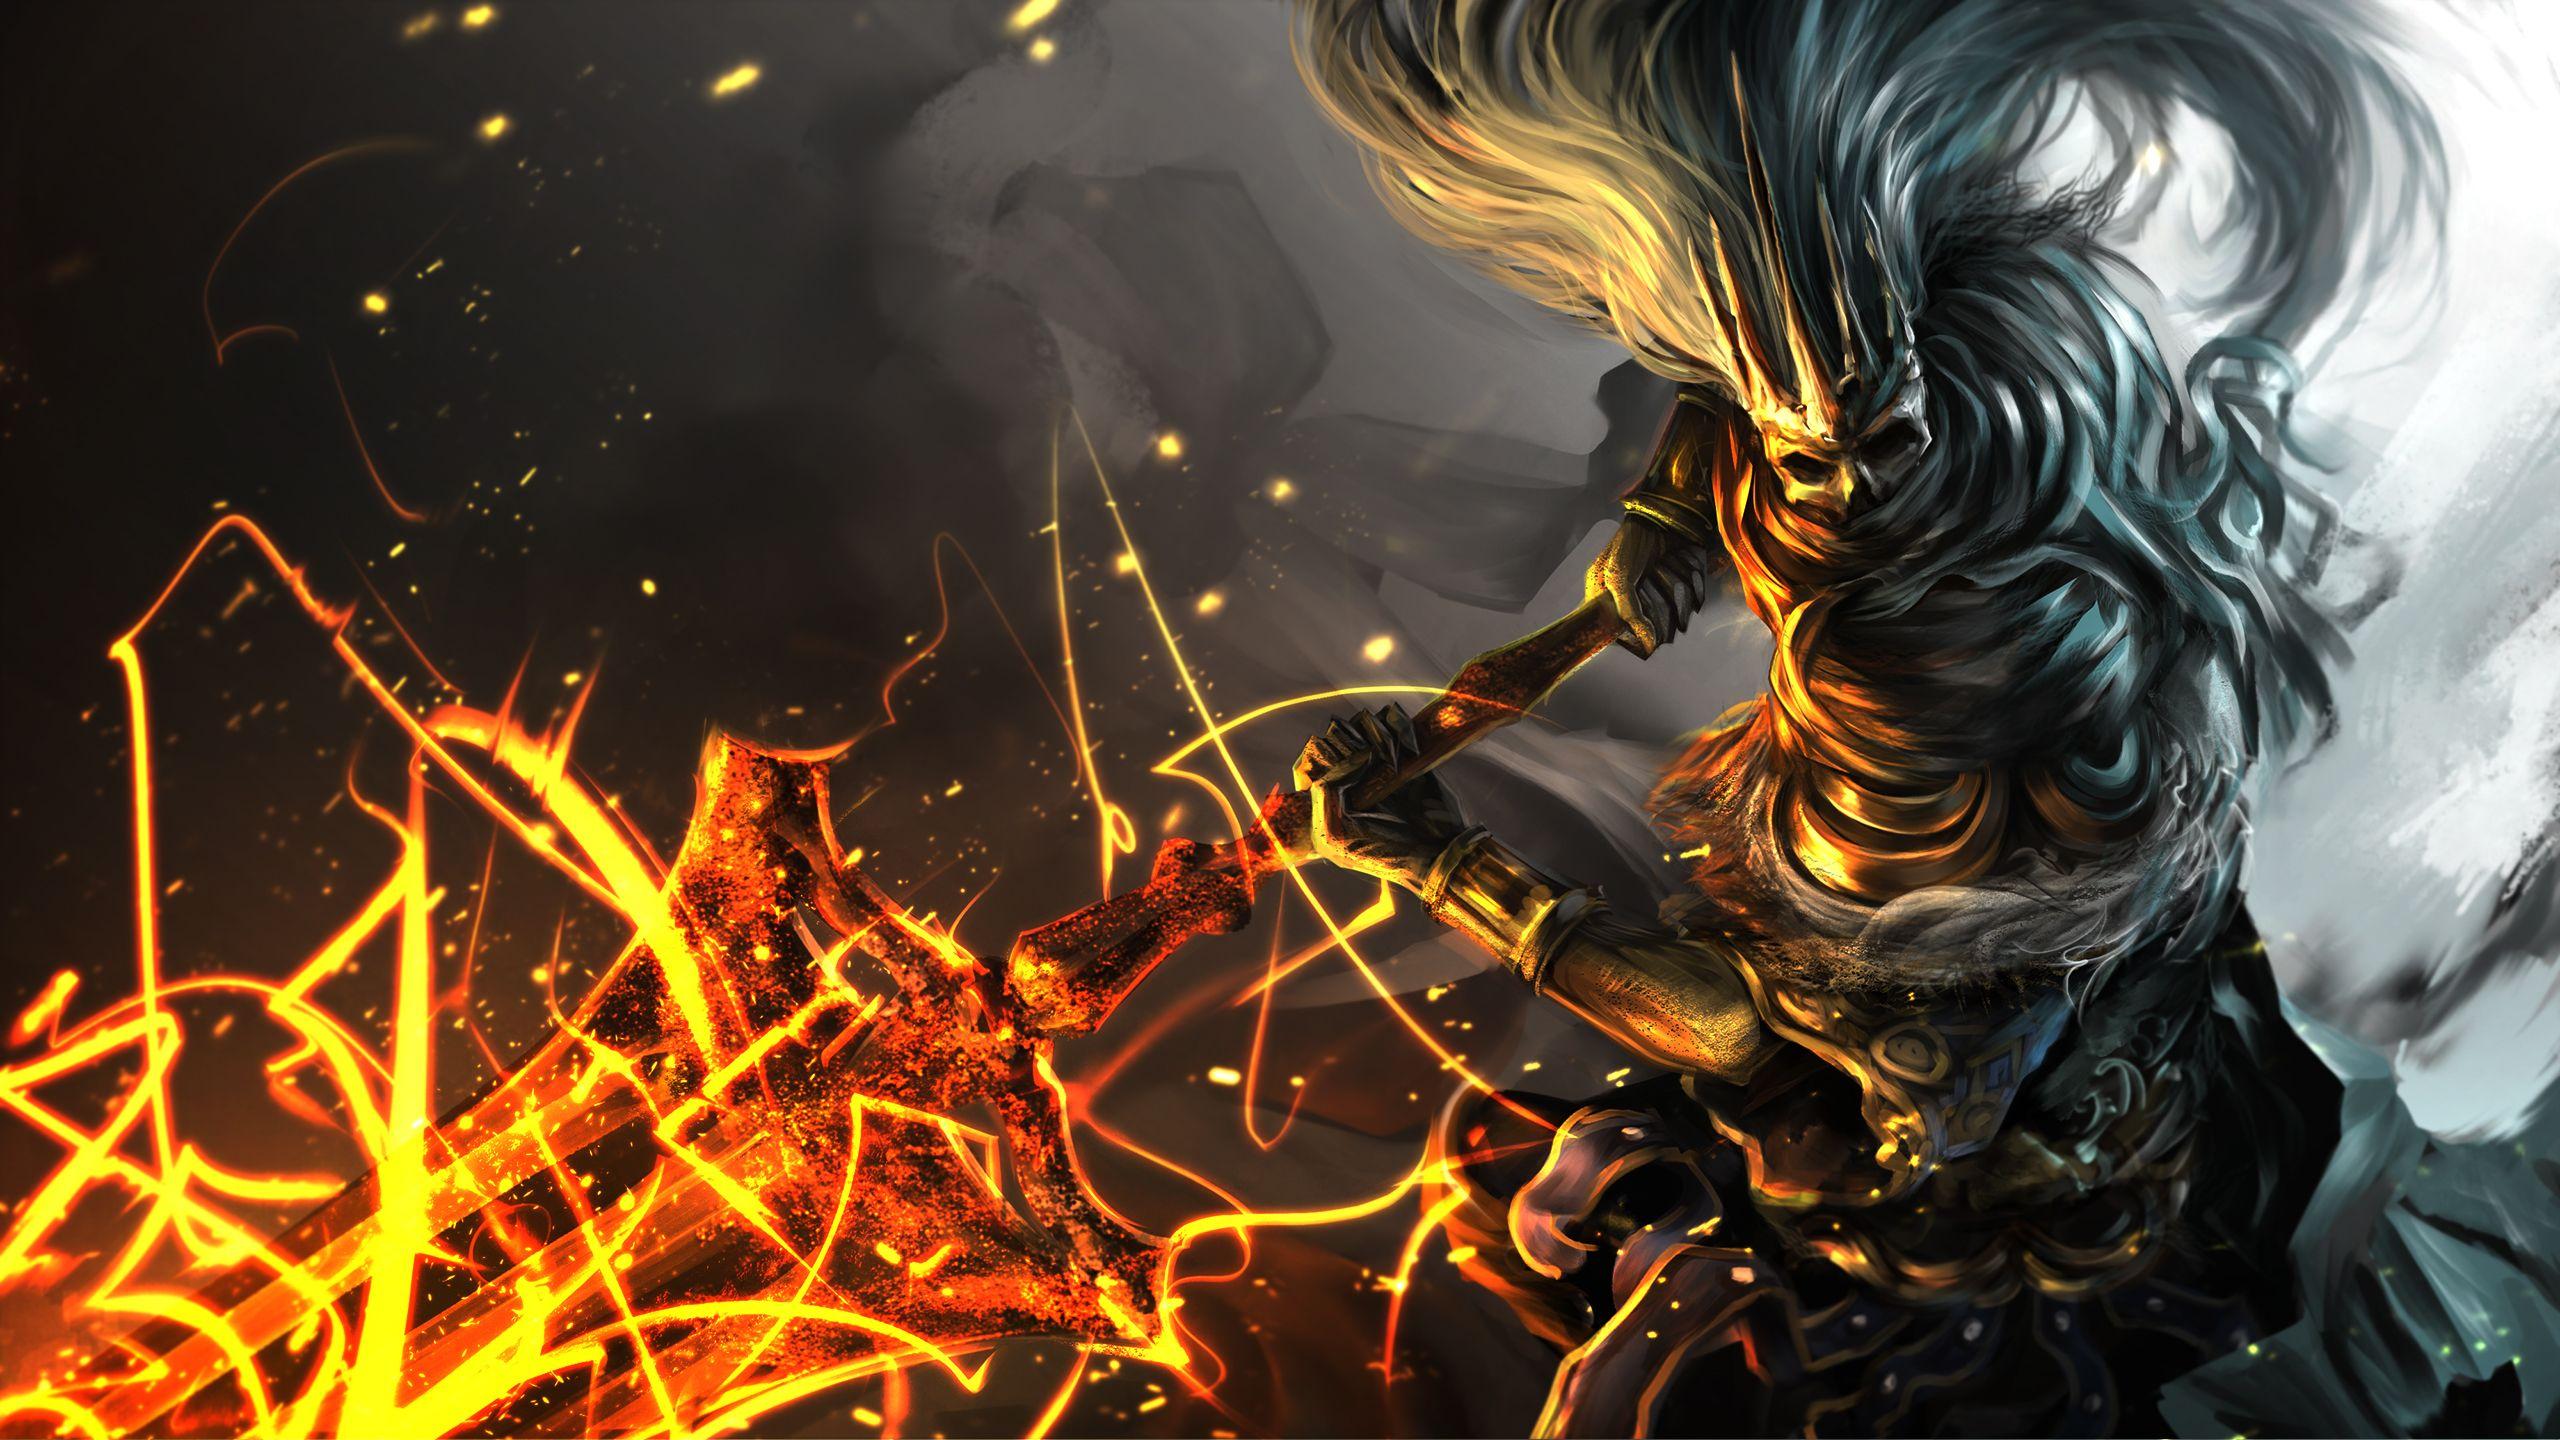 Dark Souls Wallpapers Full Hd Is 4k Wallpaper